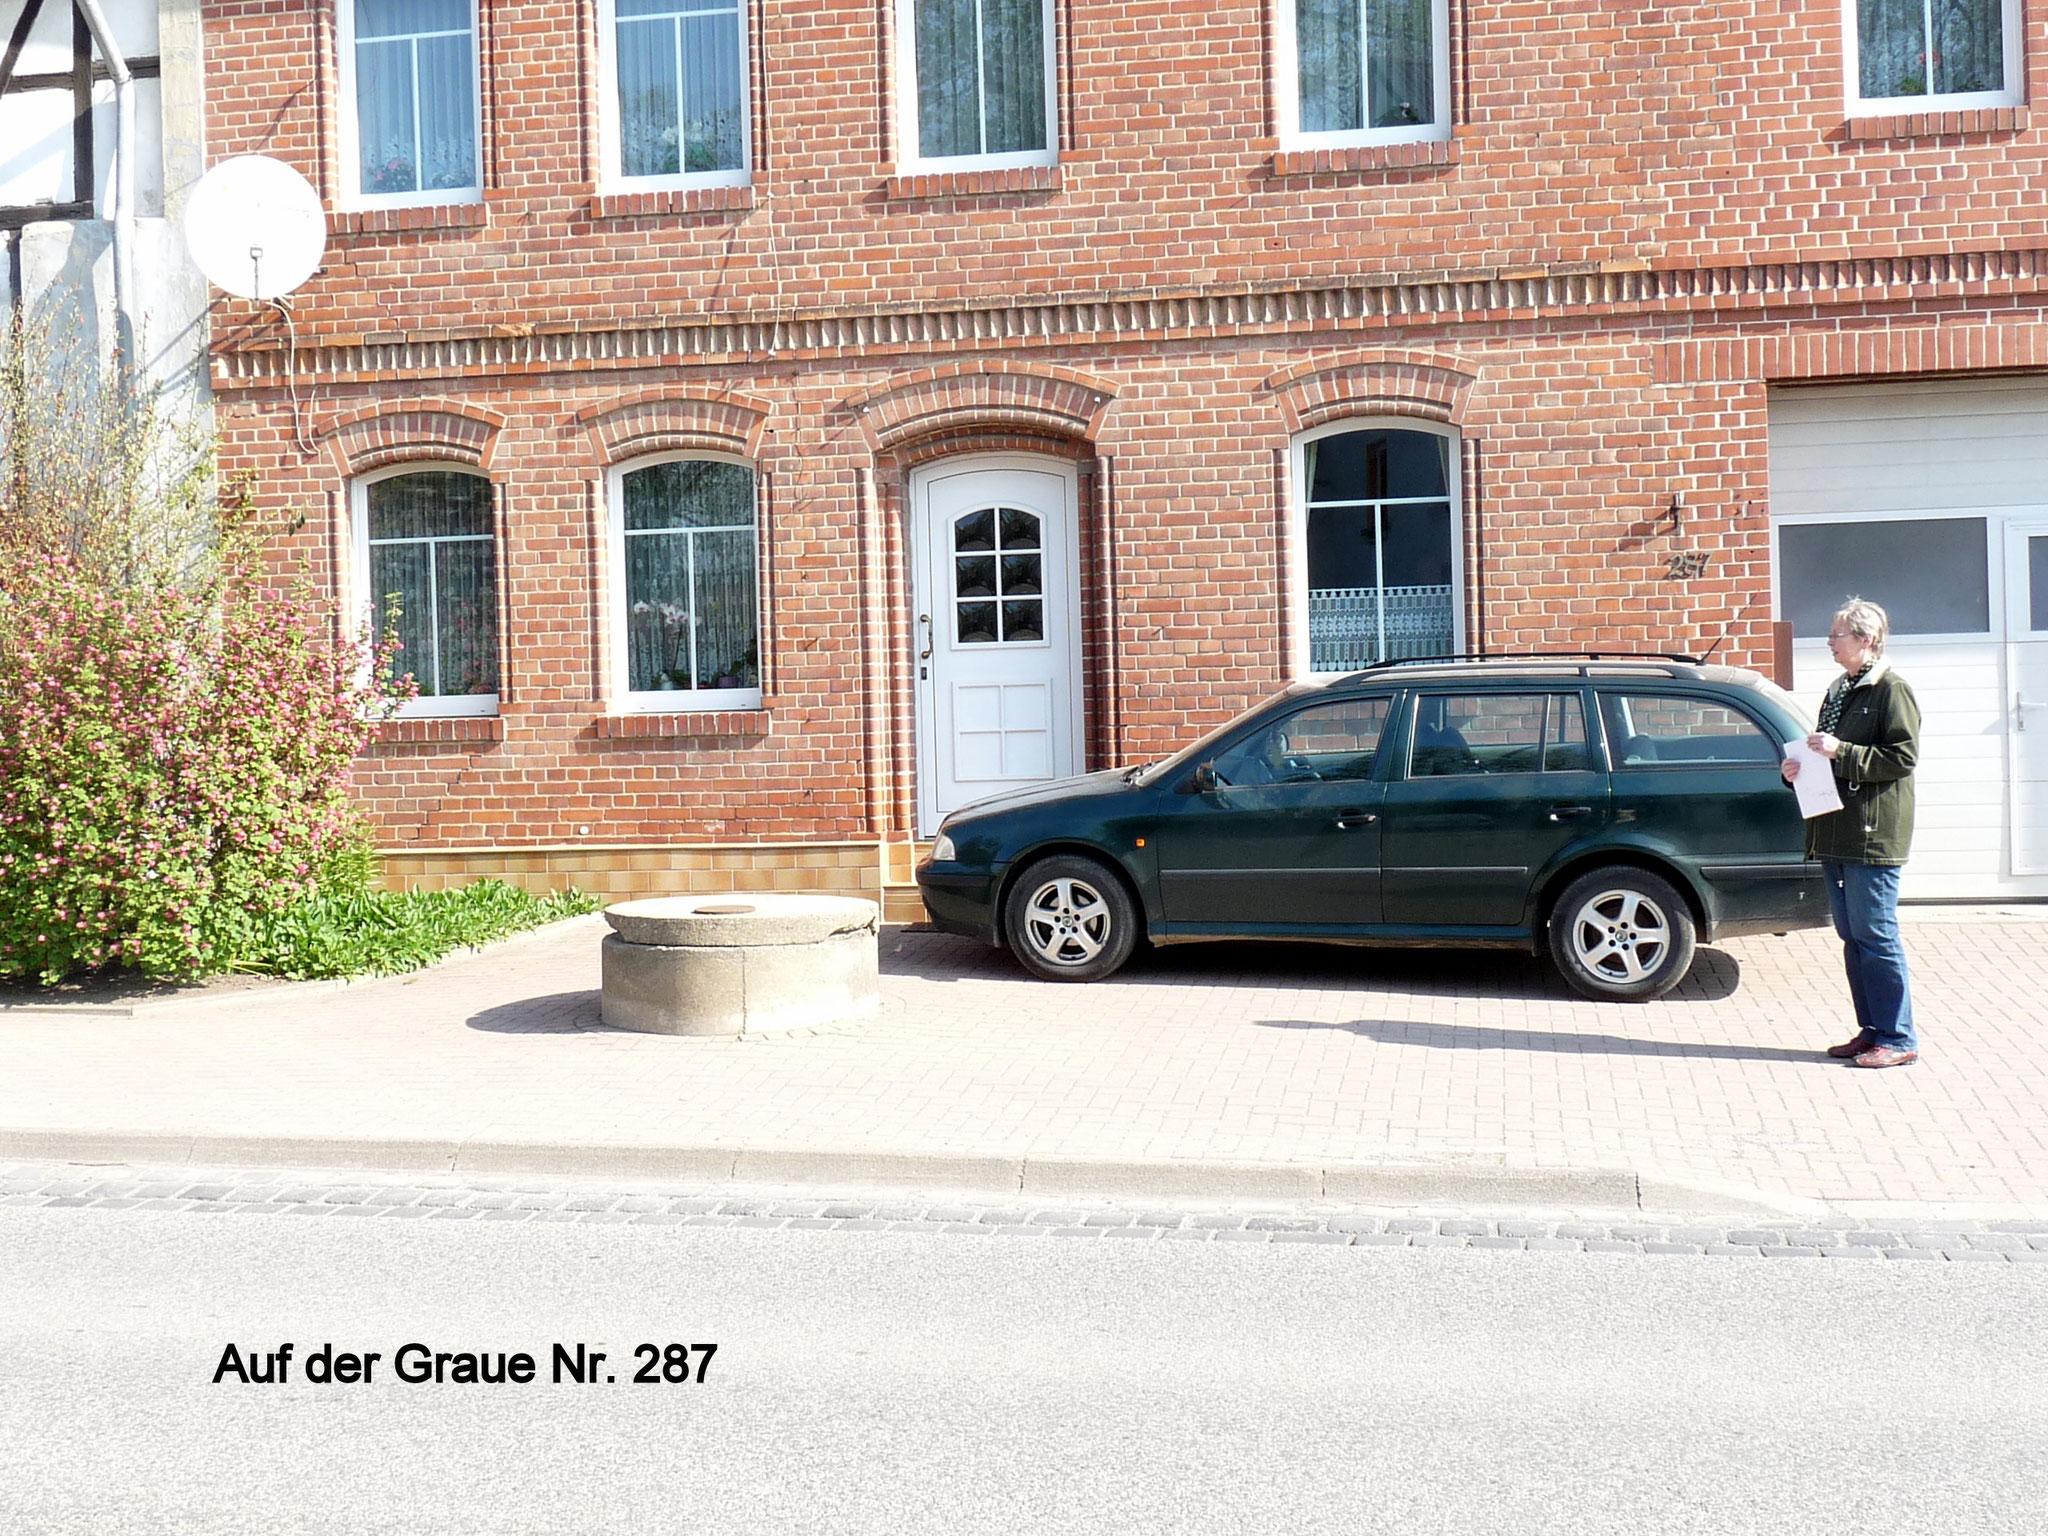 Str. d. Friedens 286